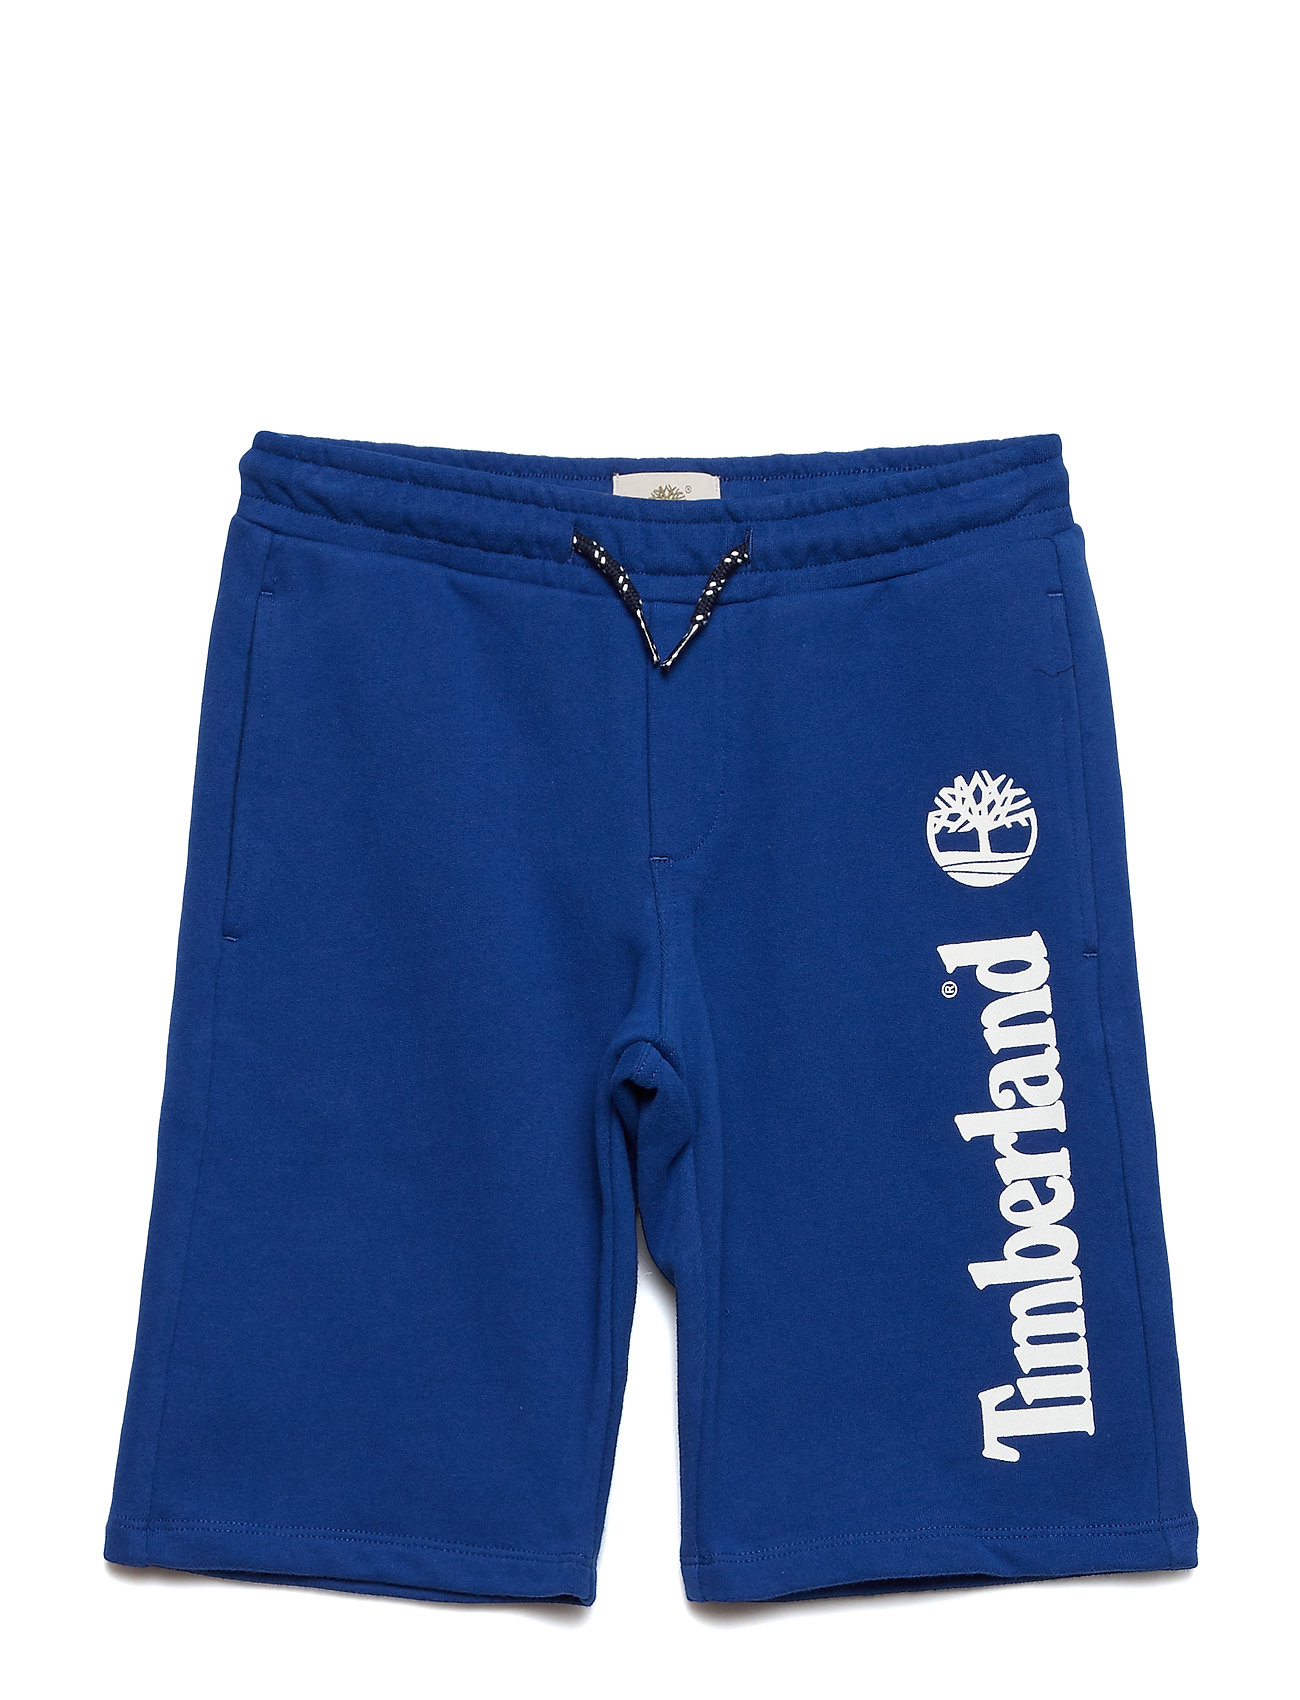 Bermuda Shorts - Timberland